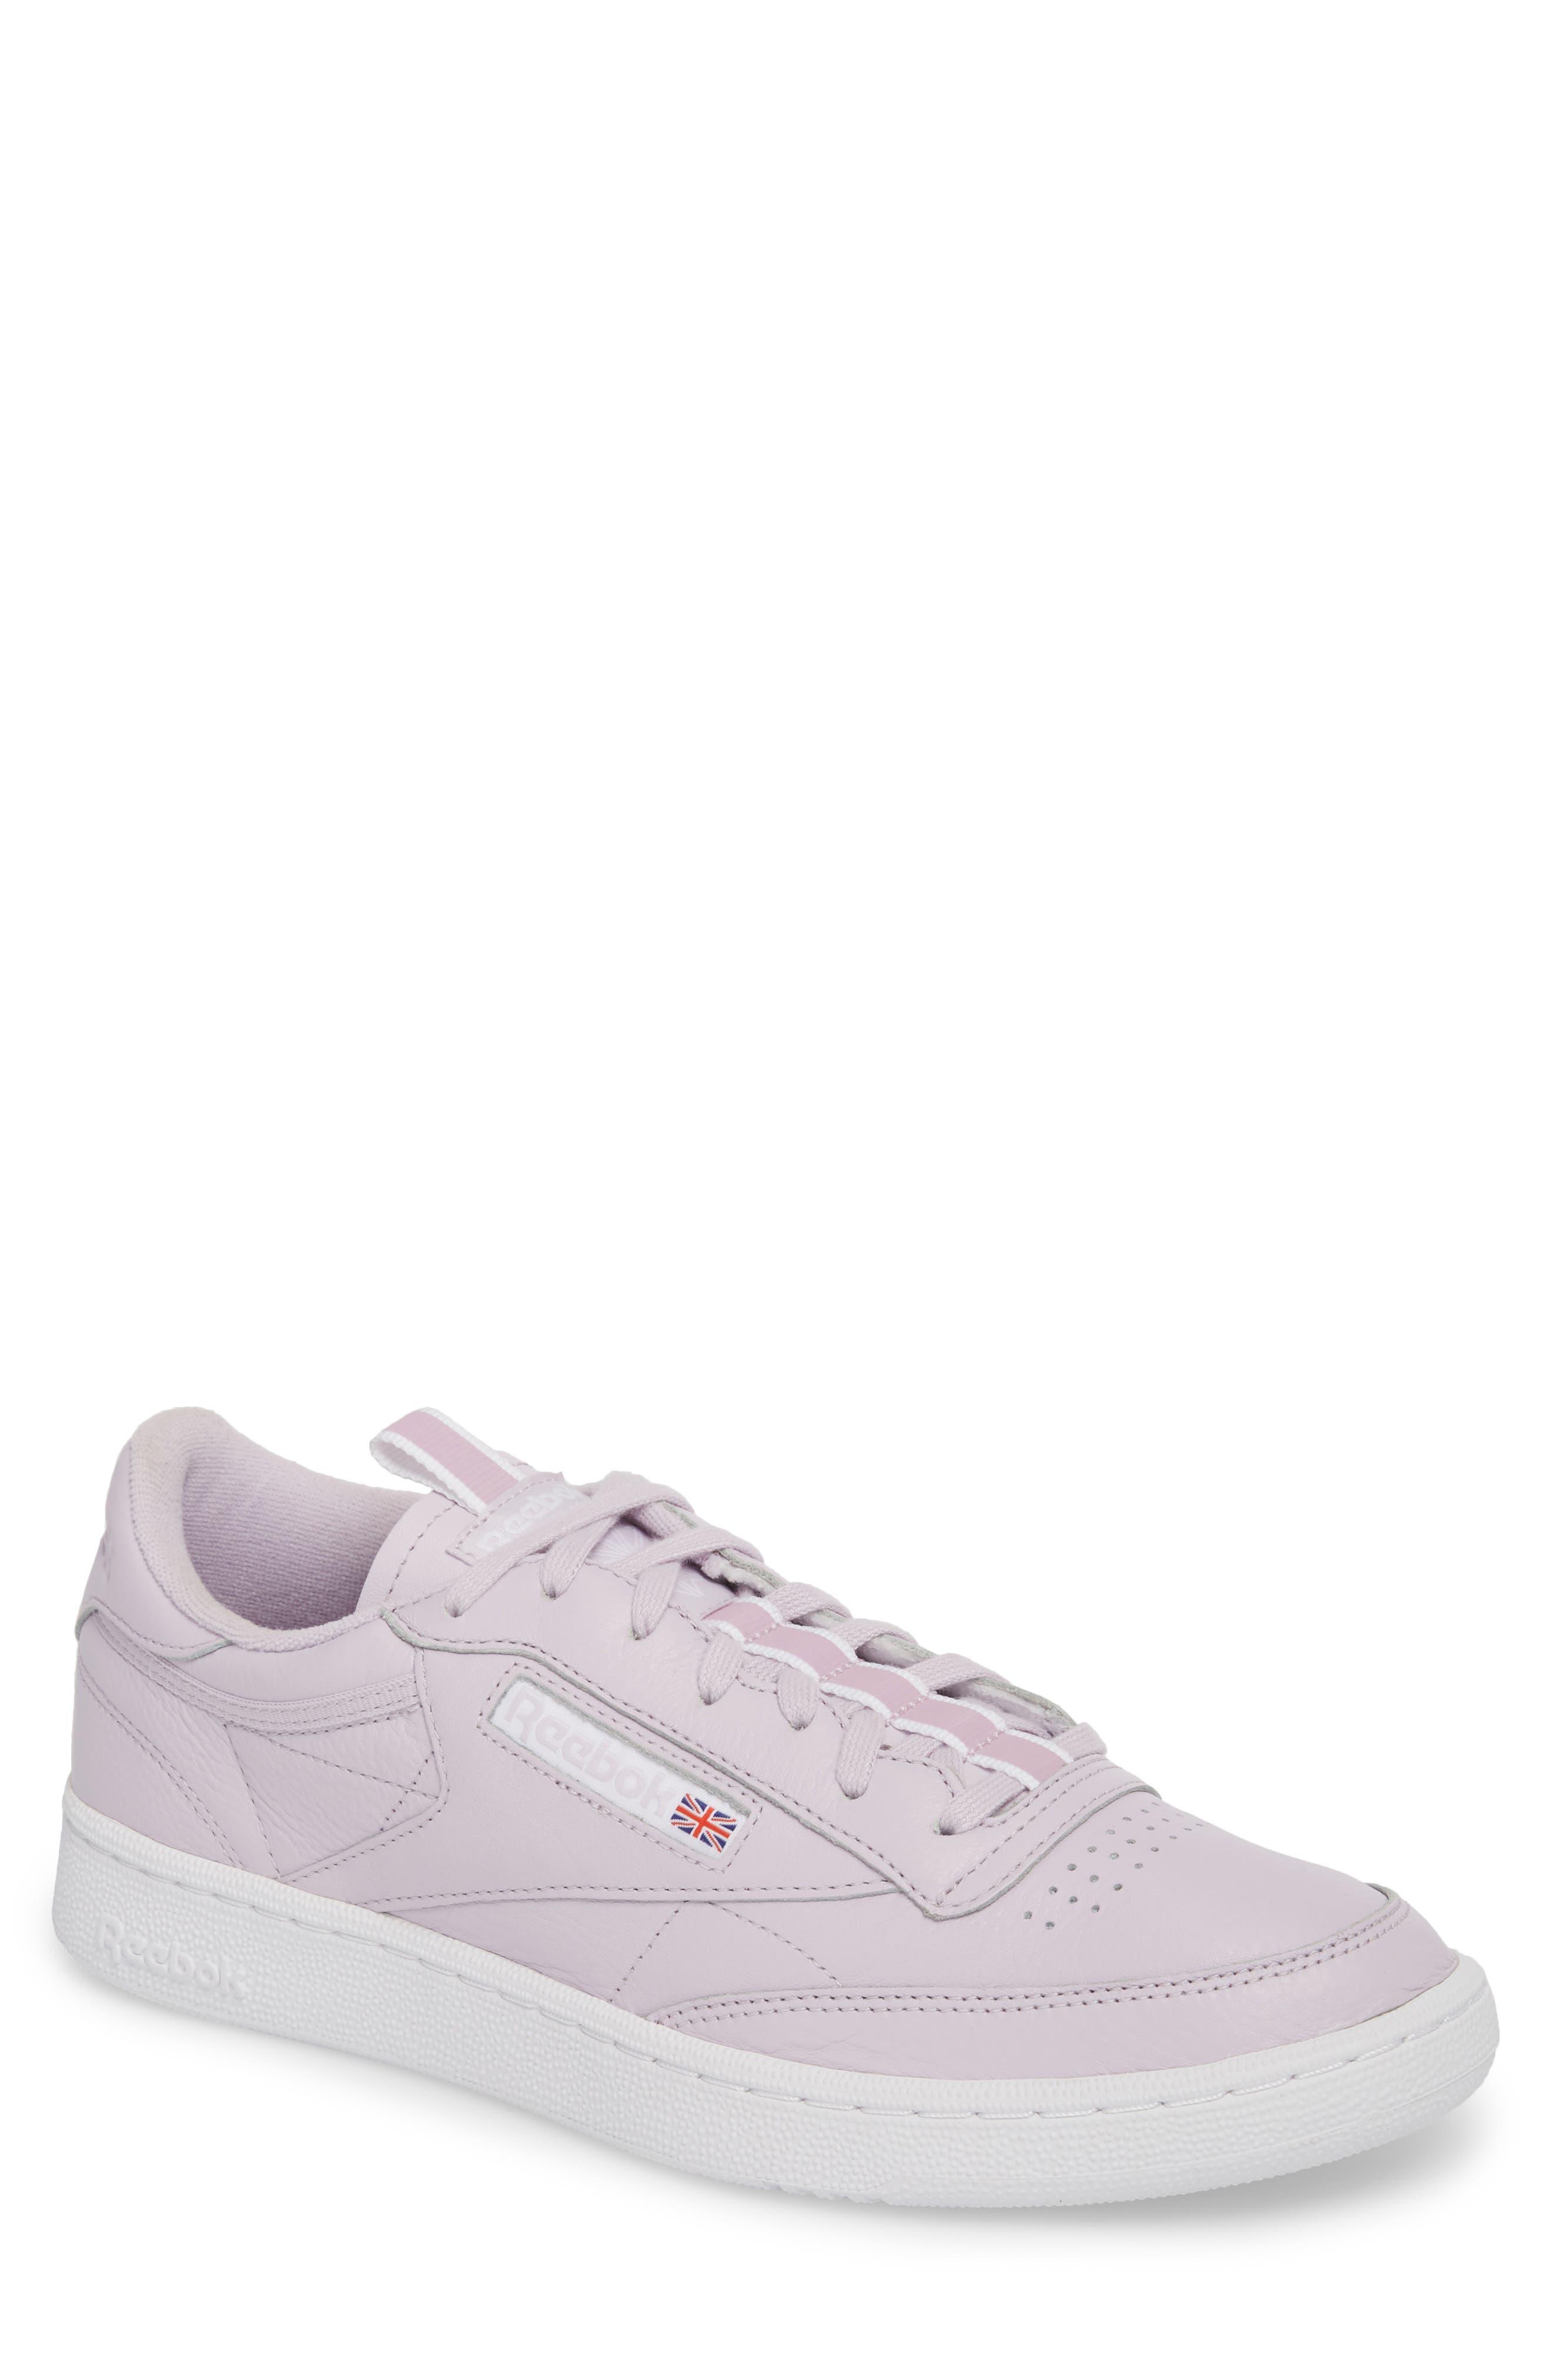 Club C 85 RT Sneaker,                         Main,                         color, Quartz/ White/ Purple Fog